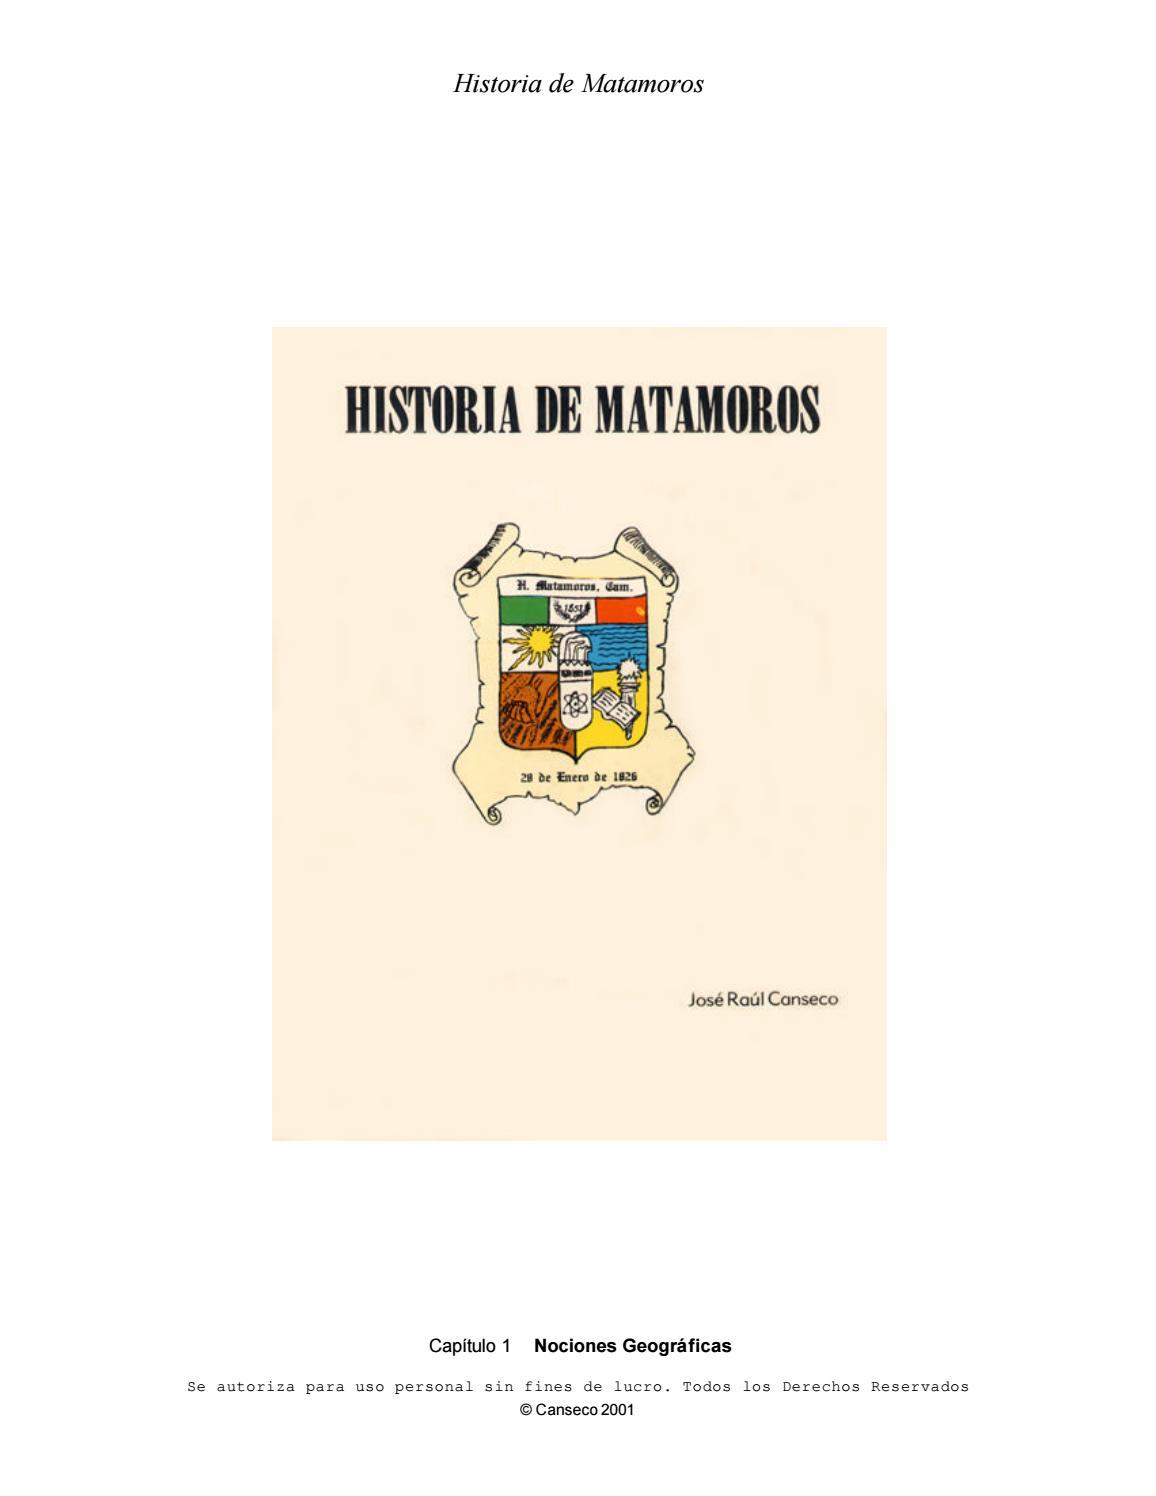 HISTORIA DE MATAMOROS por Josè Raul Canseco by MANUEL HUMBERTO ...